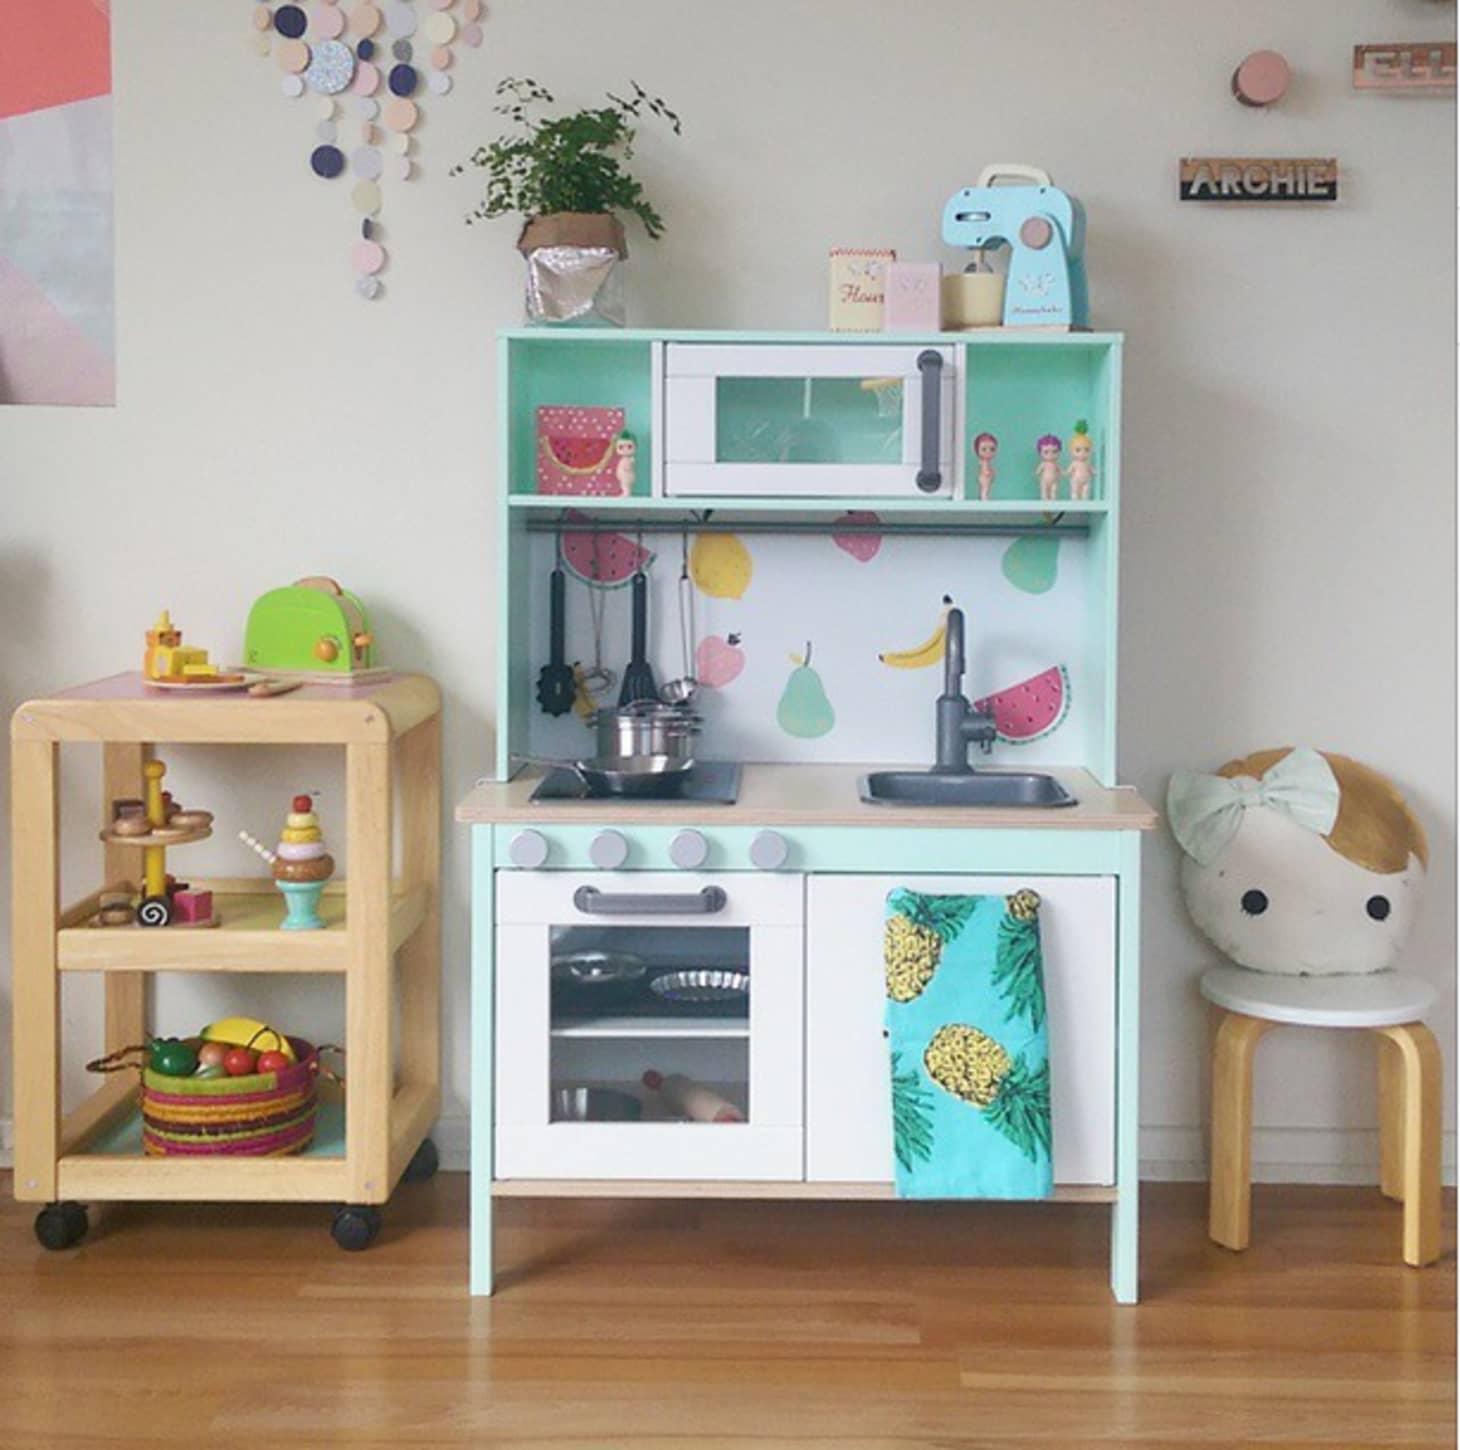 Ikea Play Kitchen 15 Duktig Hacks Apartment Therapy